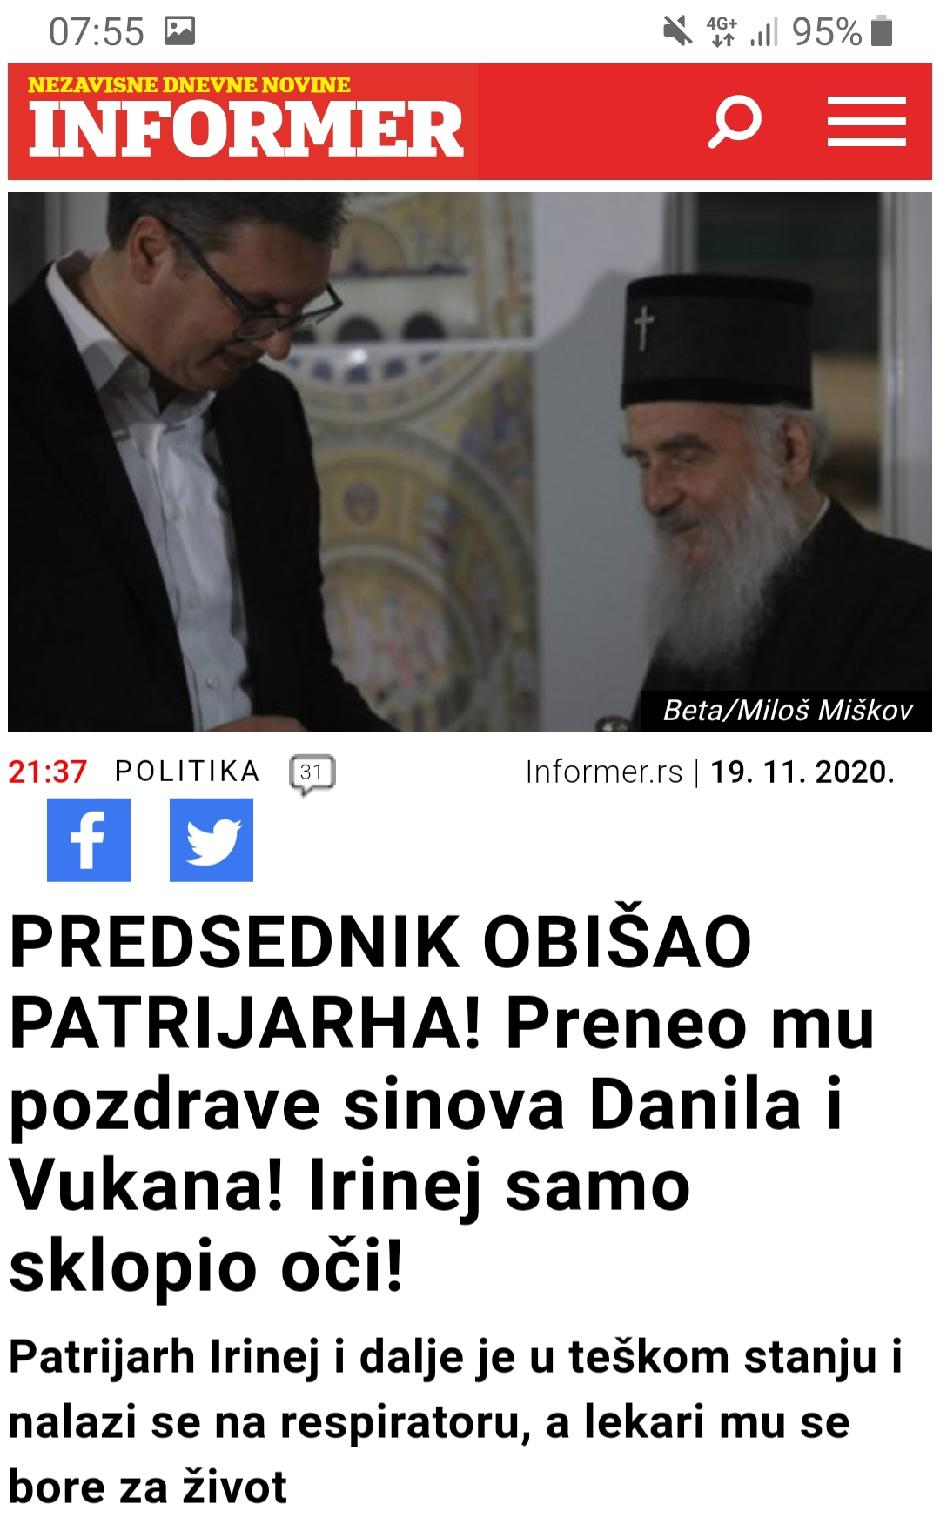 Vučić je obišao patrijarha